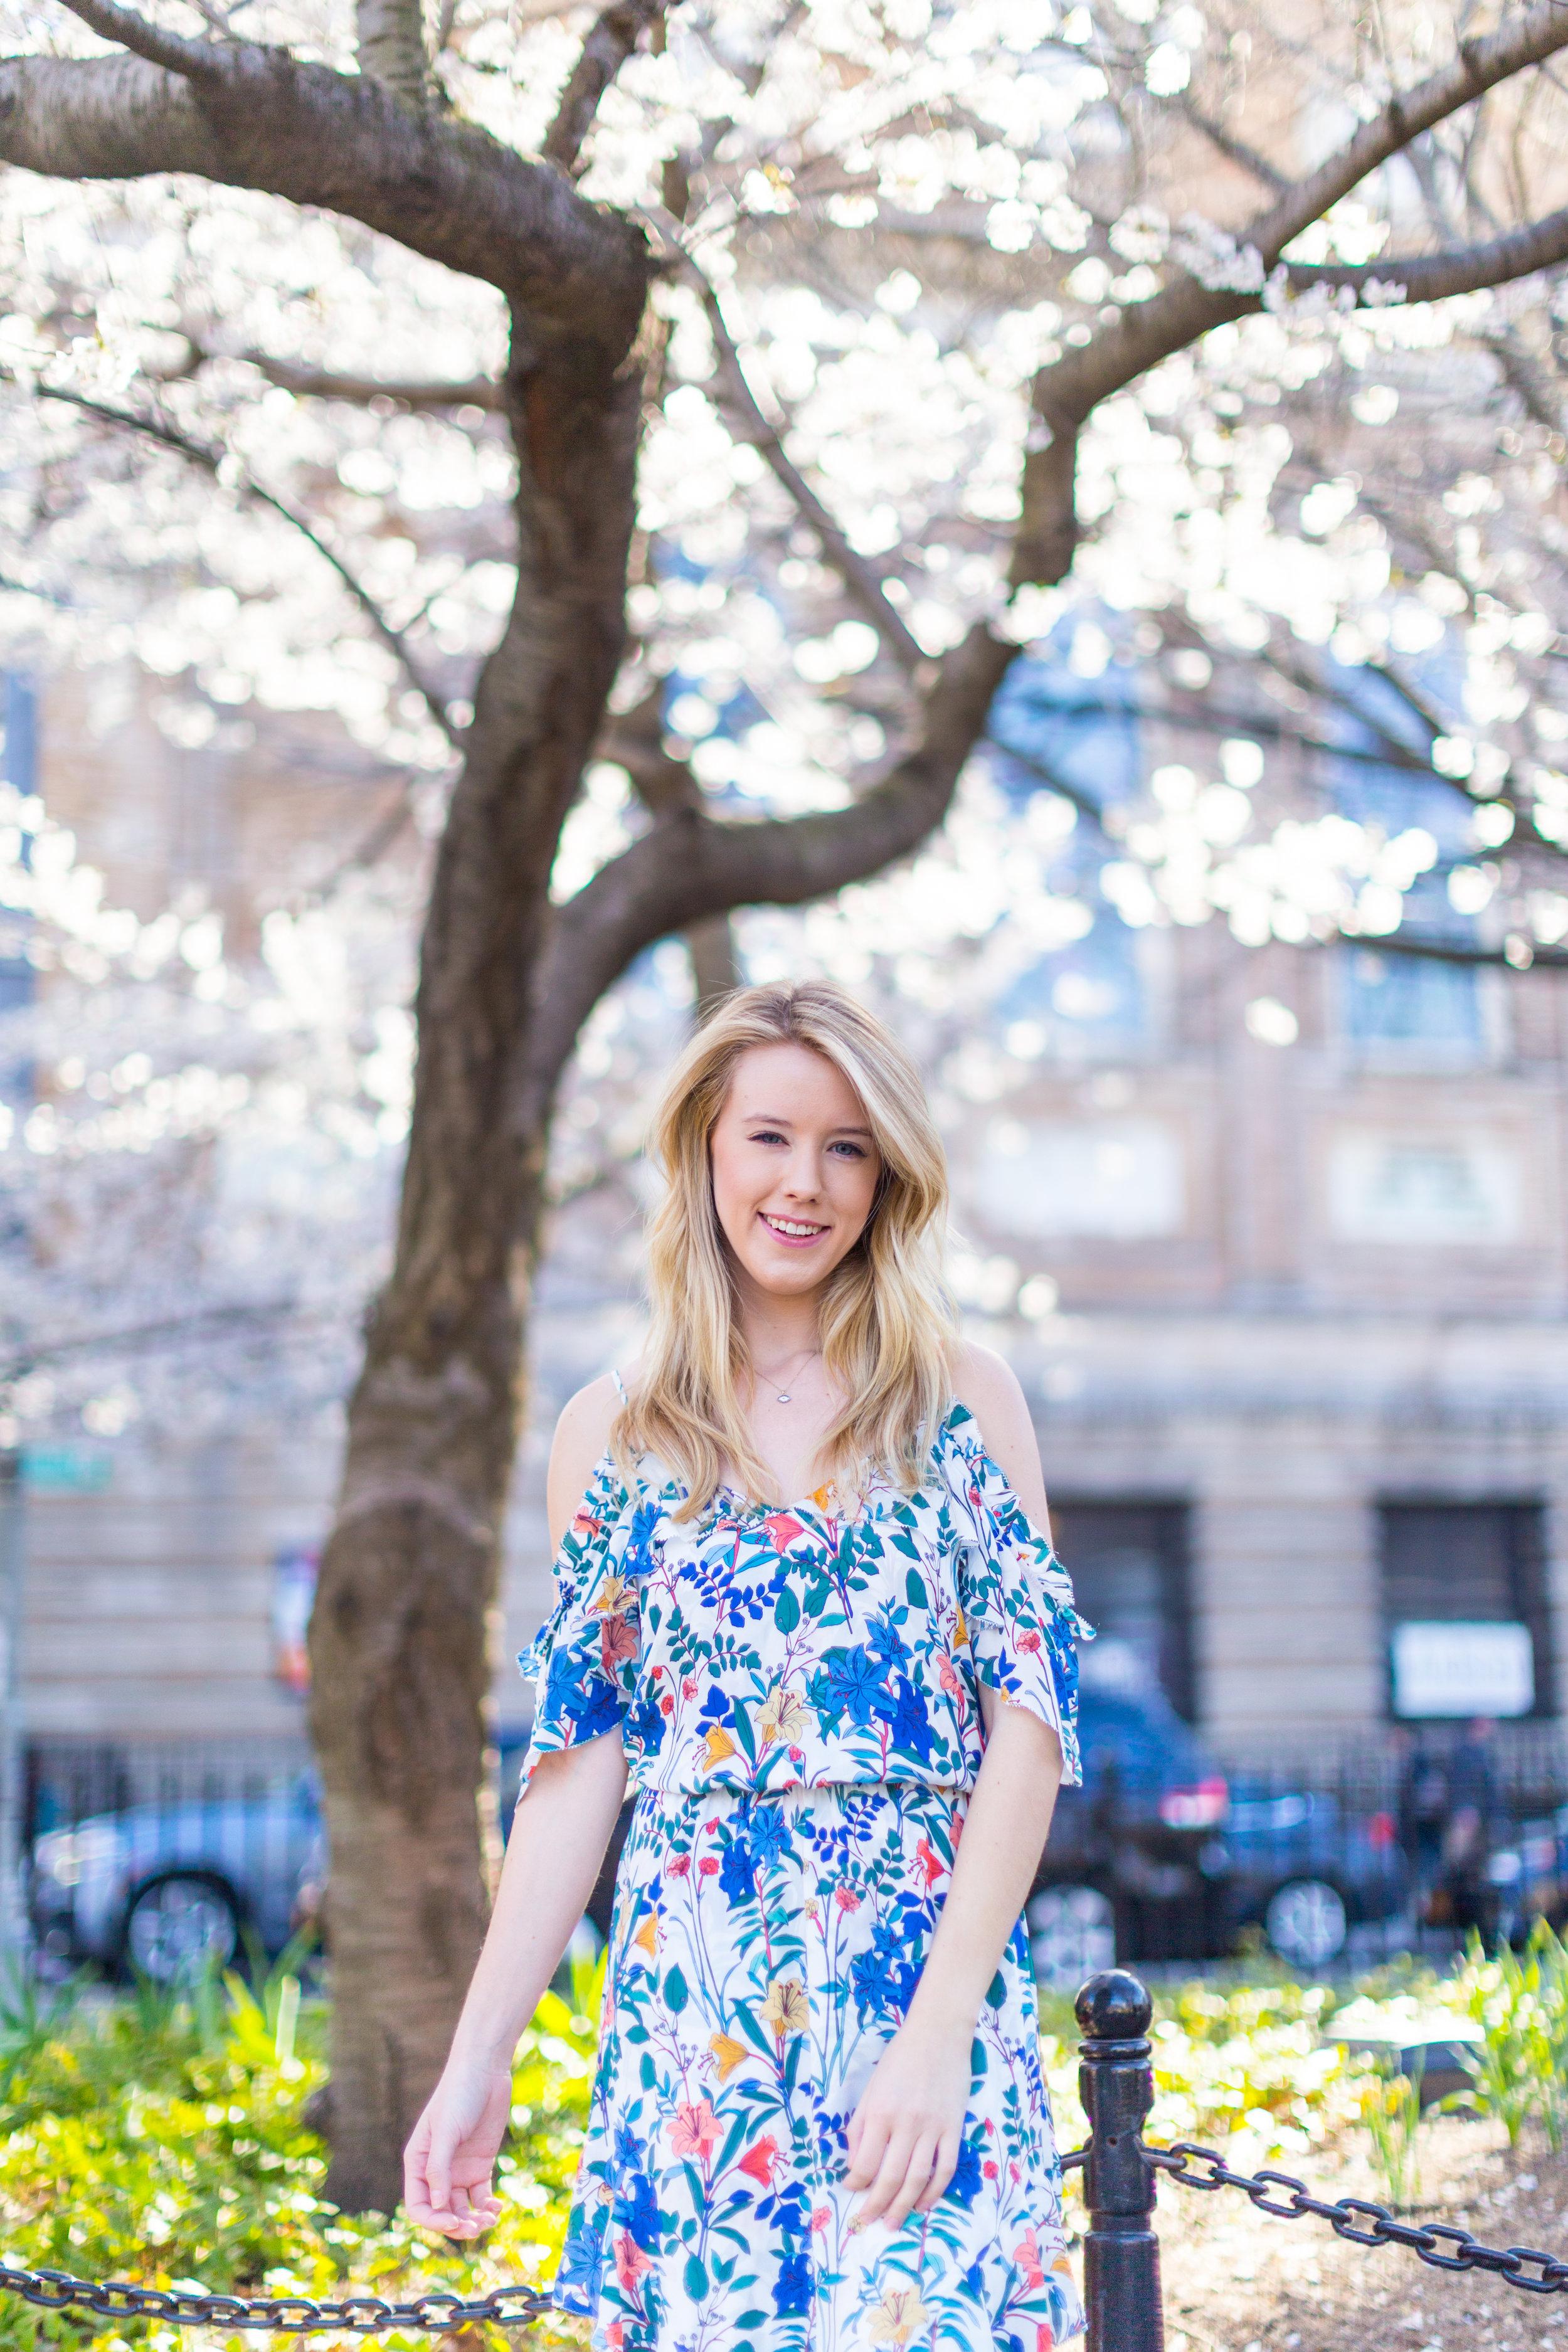 Ruffle Spring Floral Dress Washington Square Park NYC-2.jpg